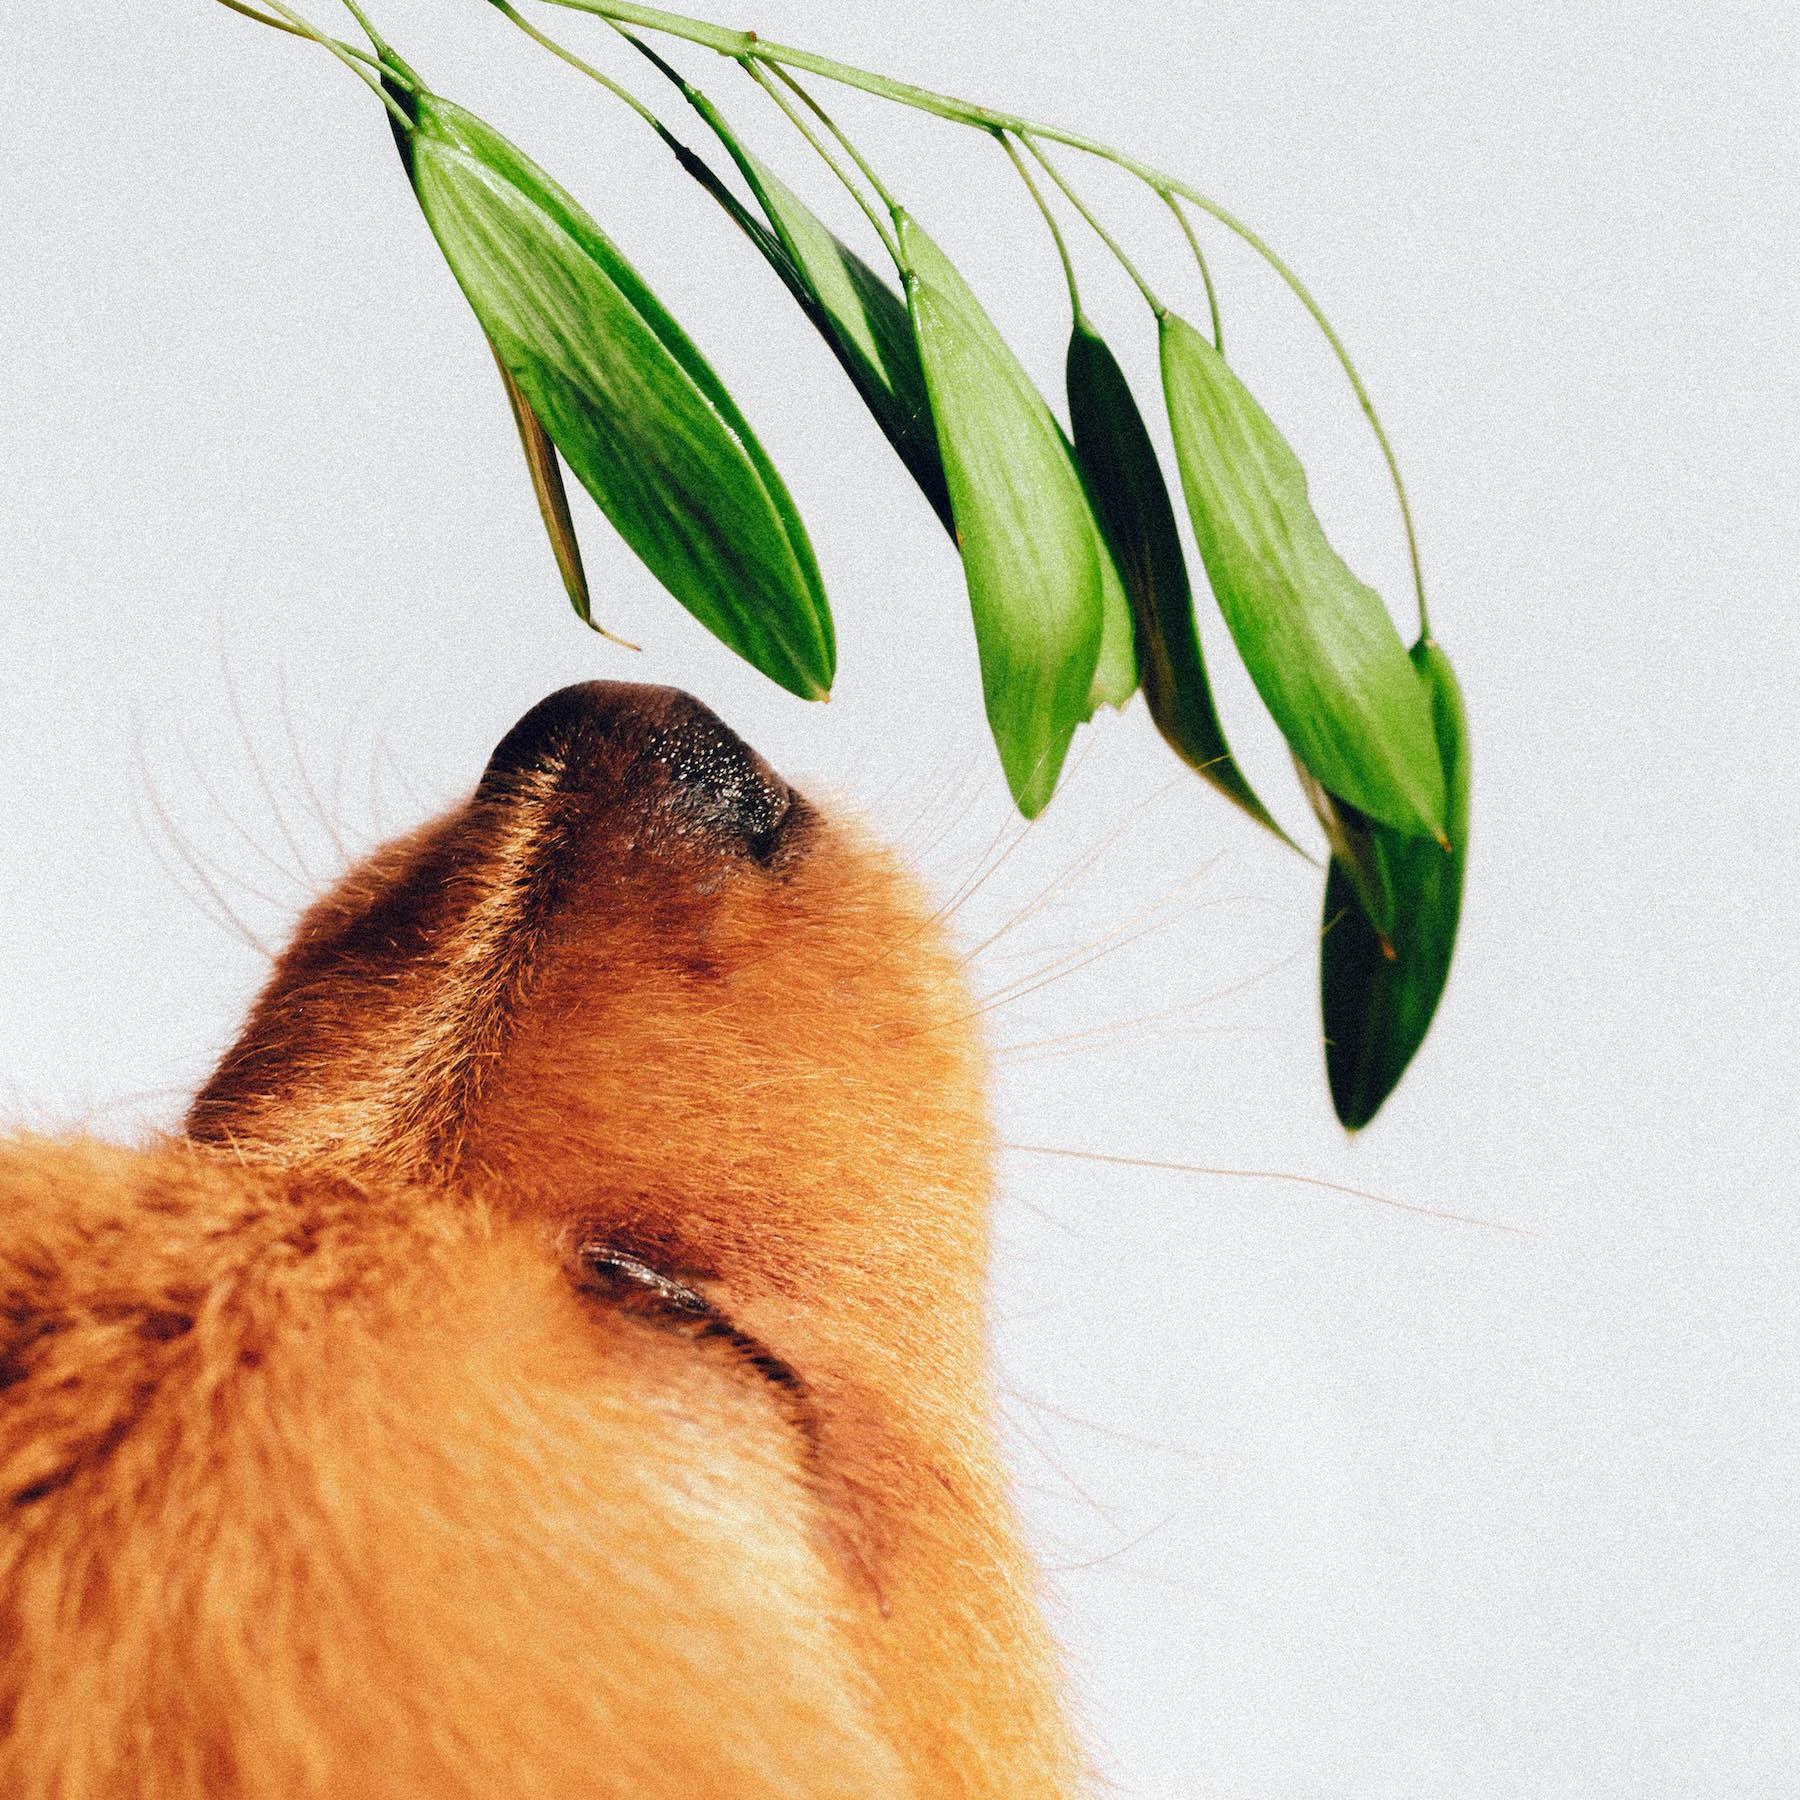 life at 30 susan fengler hund suelovesnyc_life_at_30_Hund_kind_kolumne_Susan_Fengler